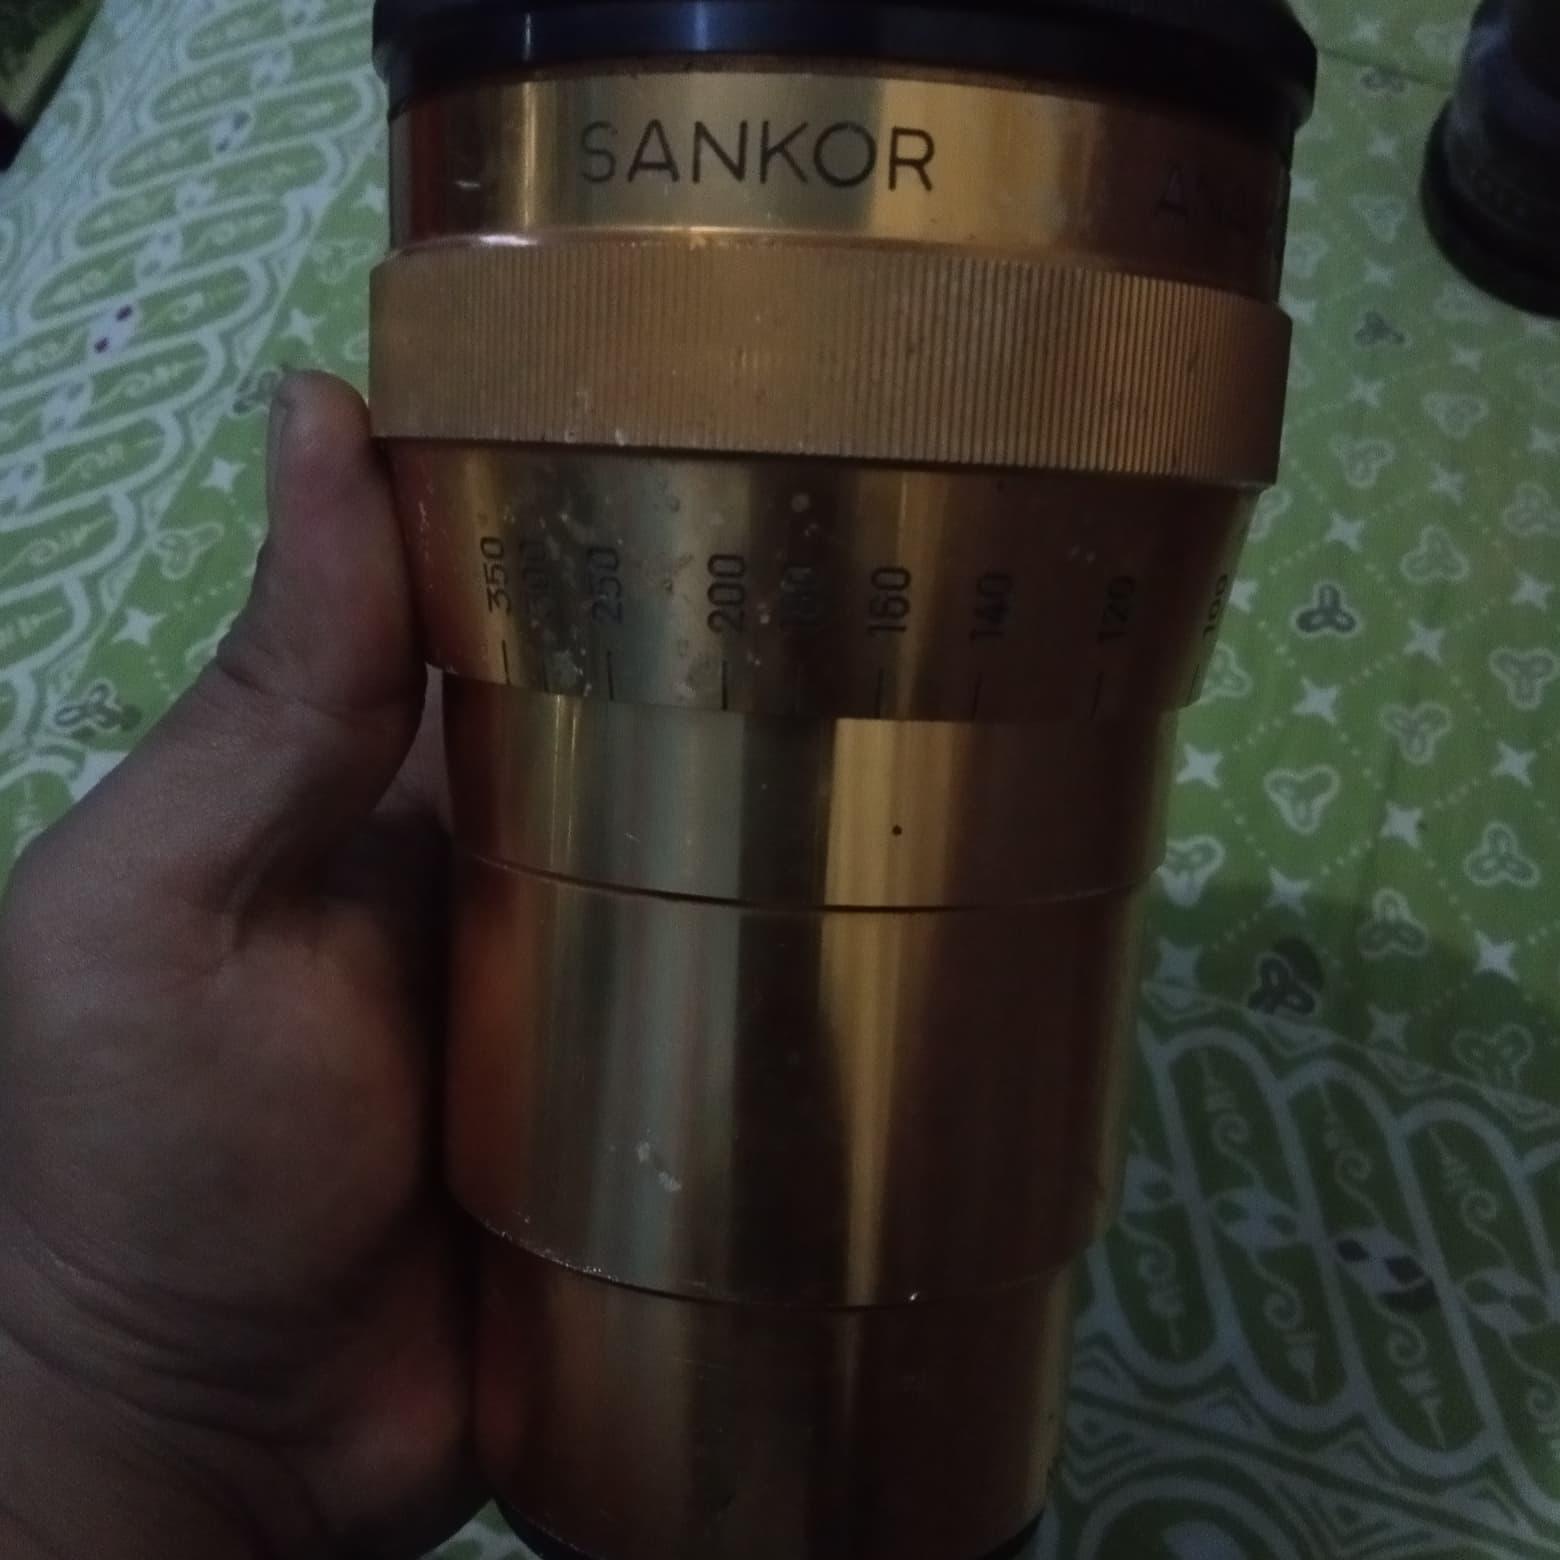 Jual lensa sankor anamorphic - Kota Malang - freedom88